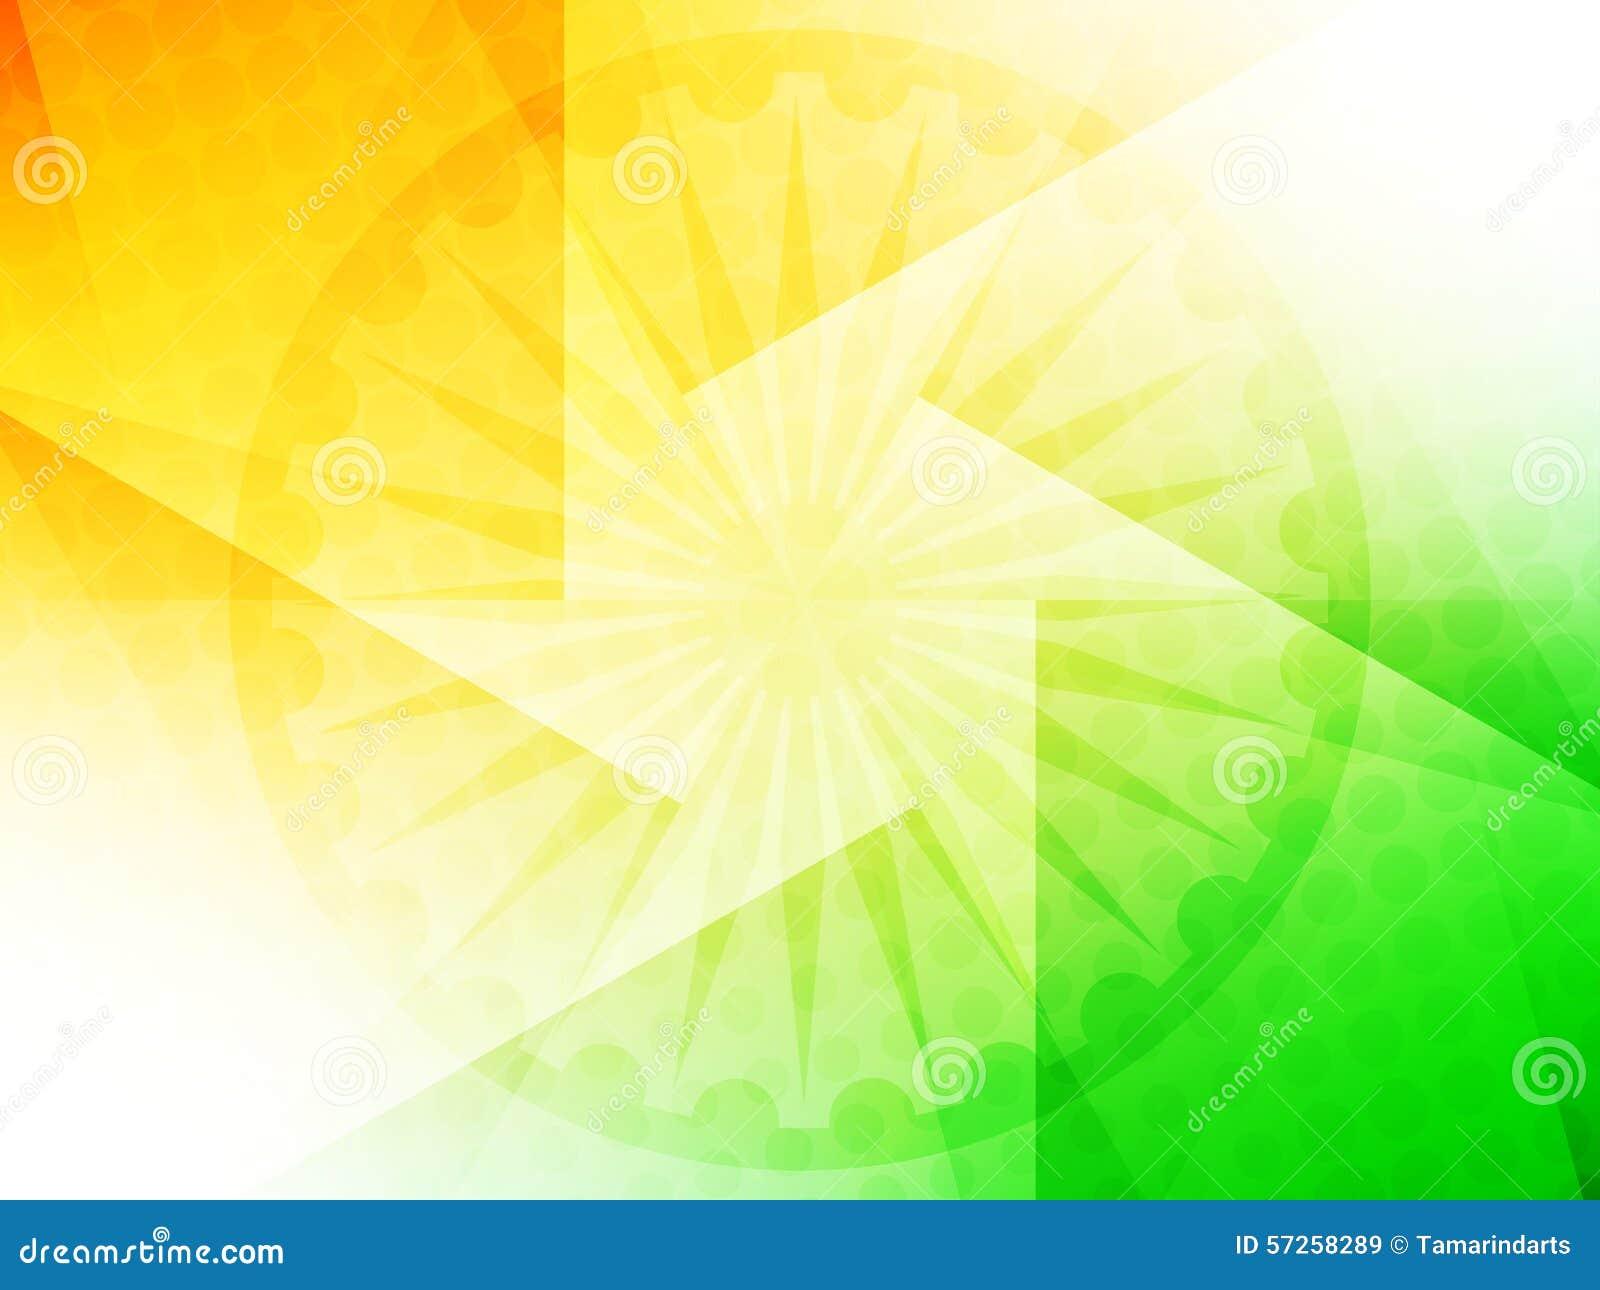 Indian Flag Theme: Beautiful Indian Flag Theme Background Design. Stock